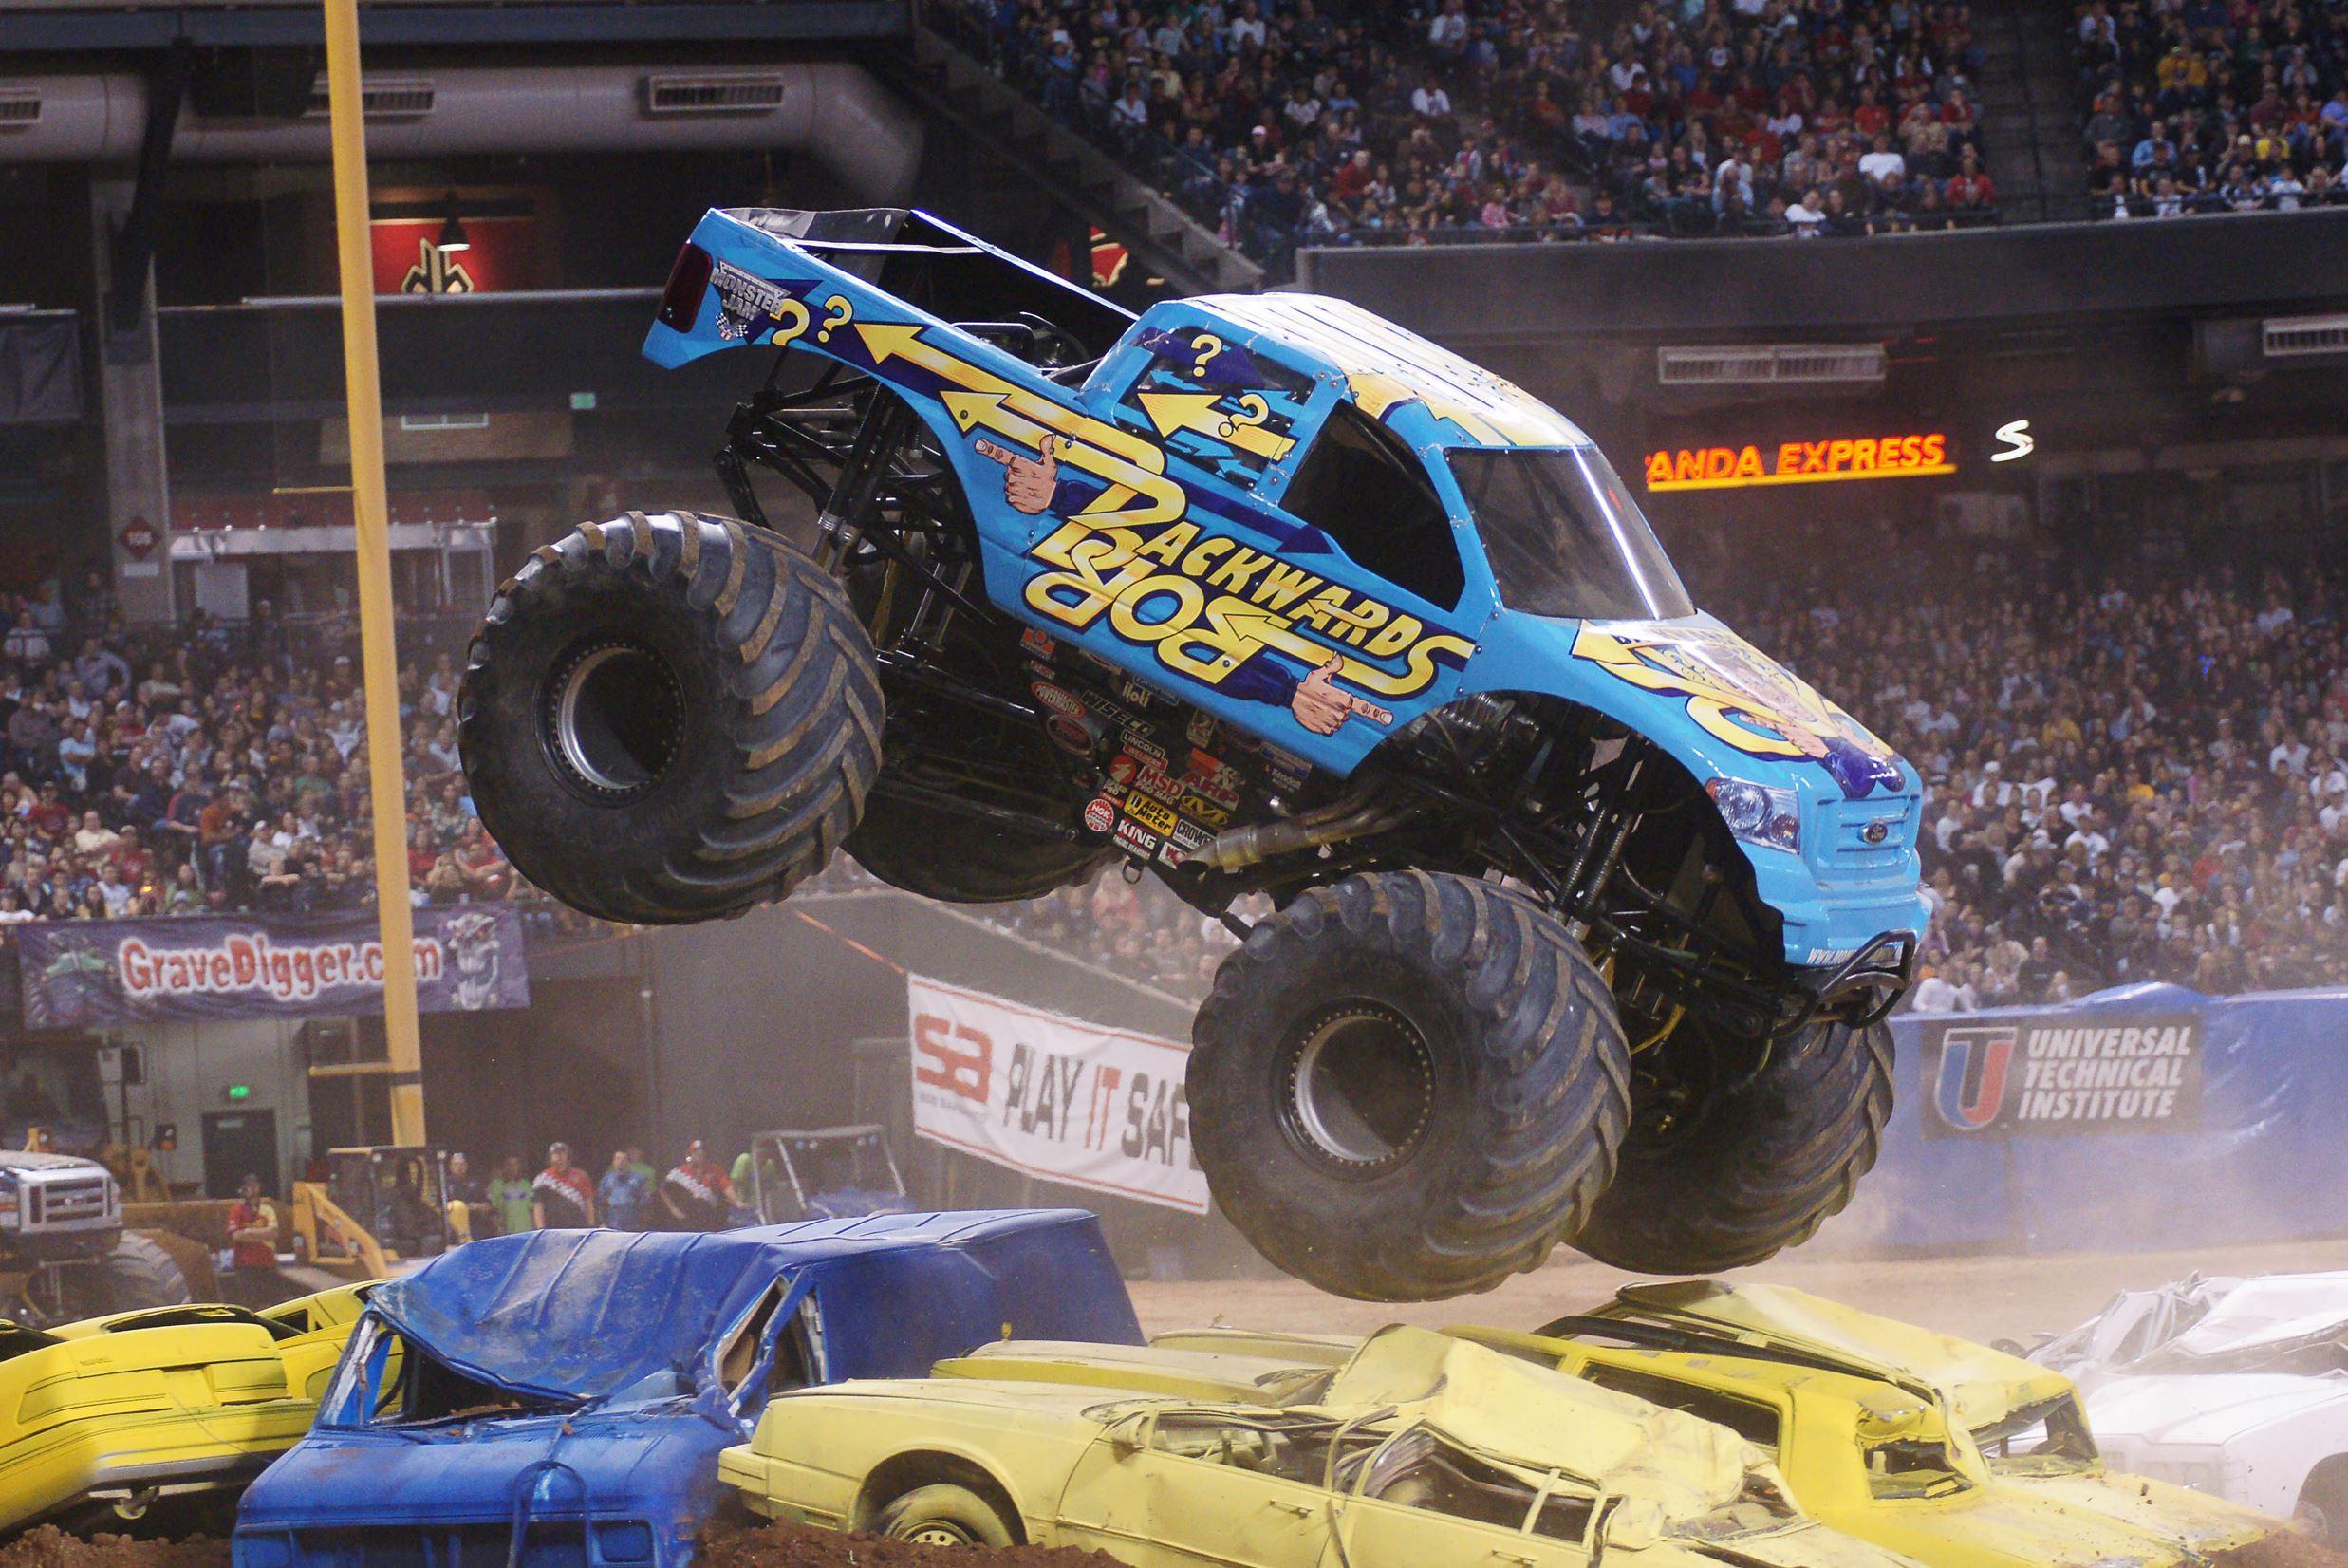 Hershey Car Show >> Monster Jam drives through Mohegan Sun Arena in Wilkes-Barre Feb. 19-21 | NEPA Scene